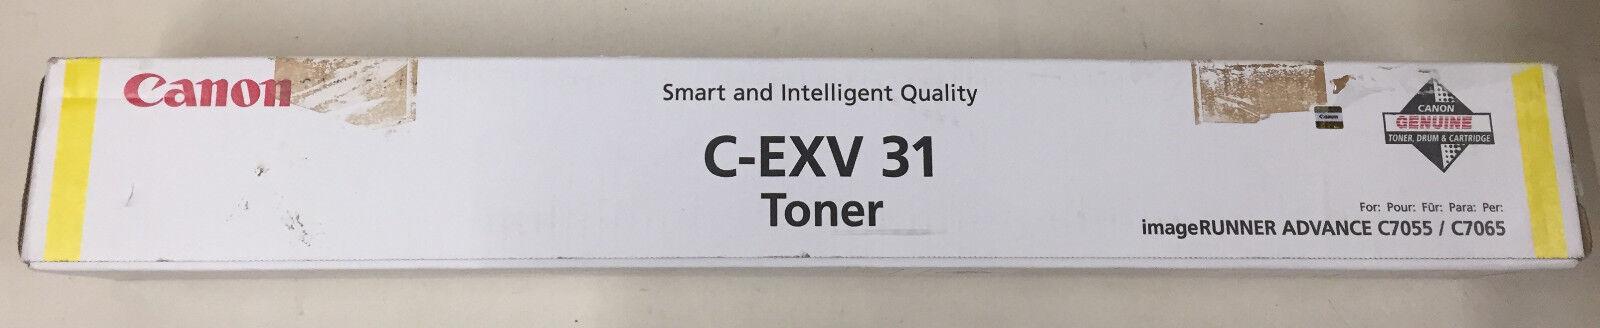 Original C-EXV 31 Toner Yellow 2804B002 für imageRUNNER ADVANCE C7055 / C7065